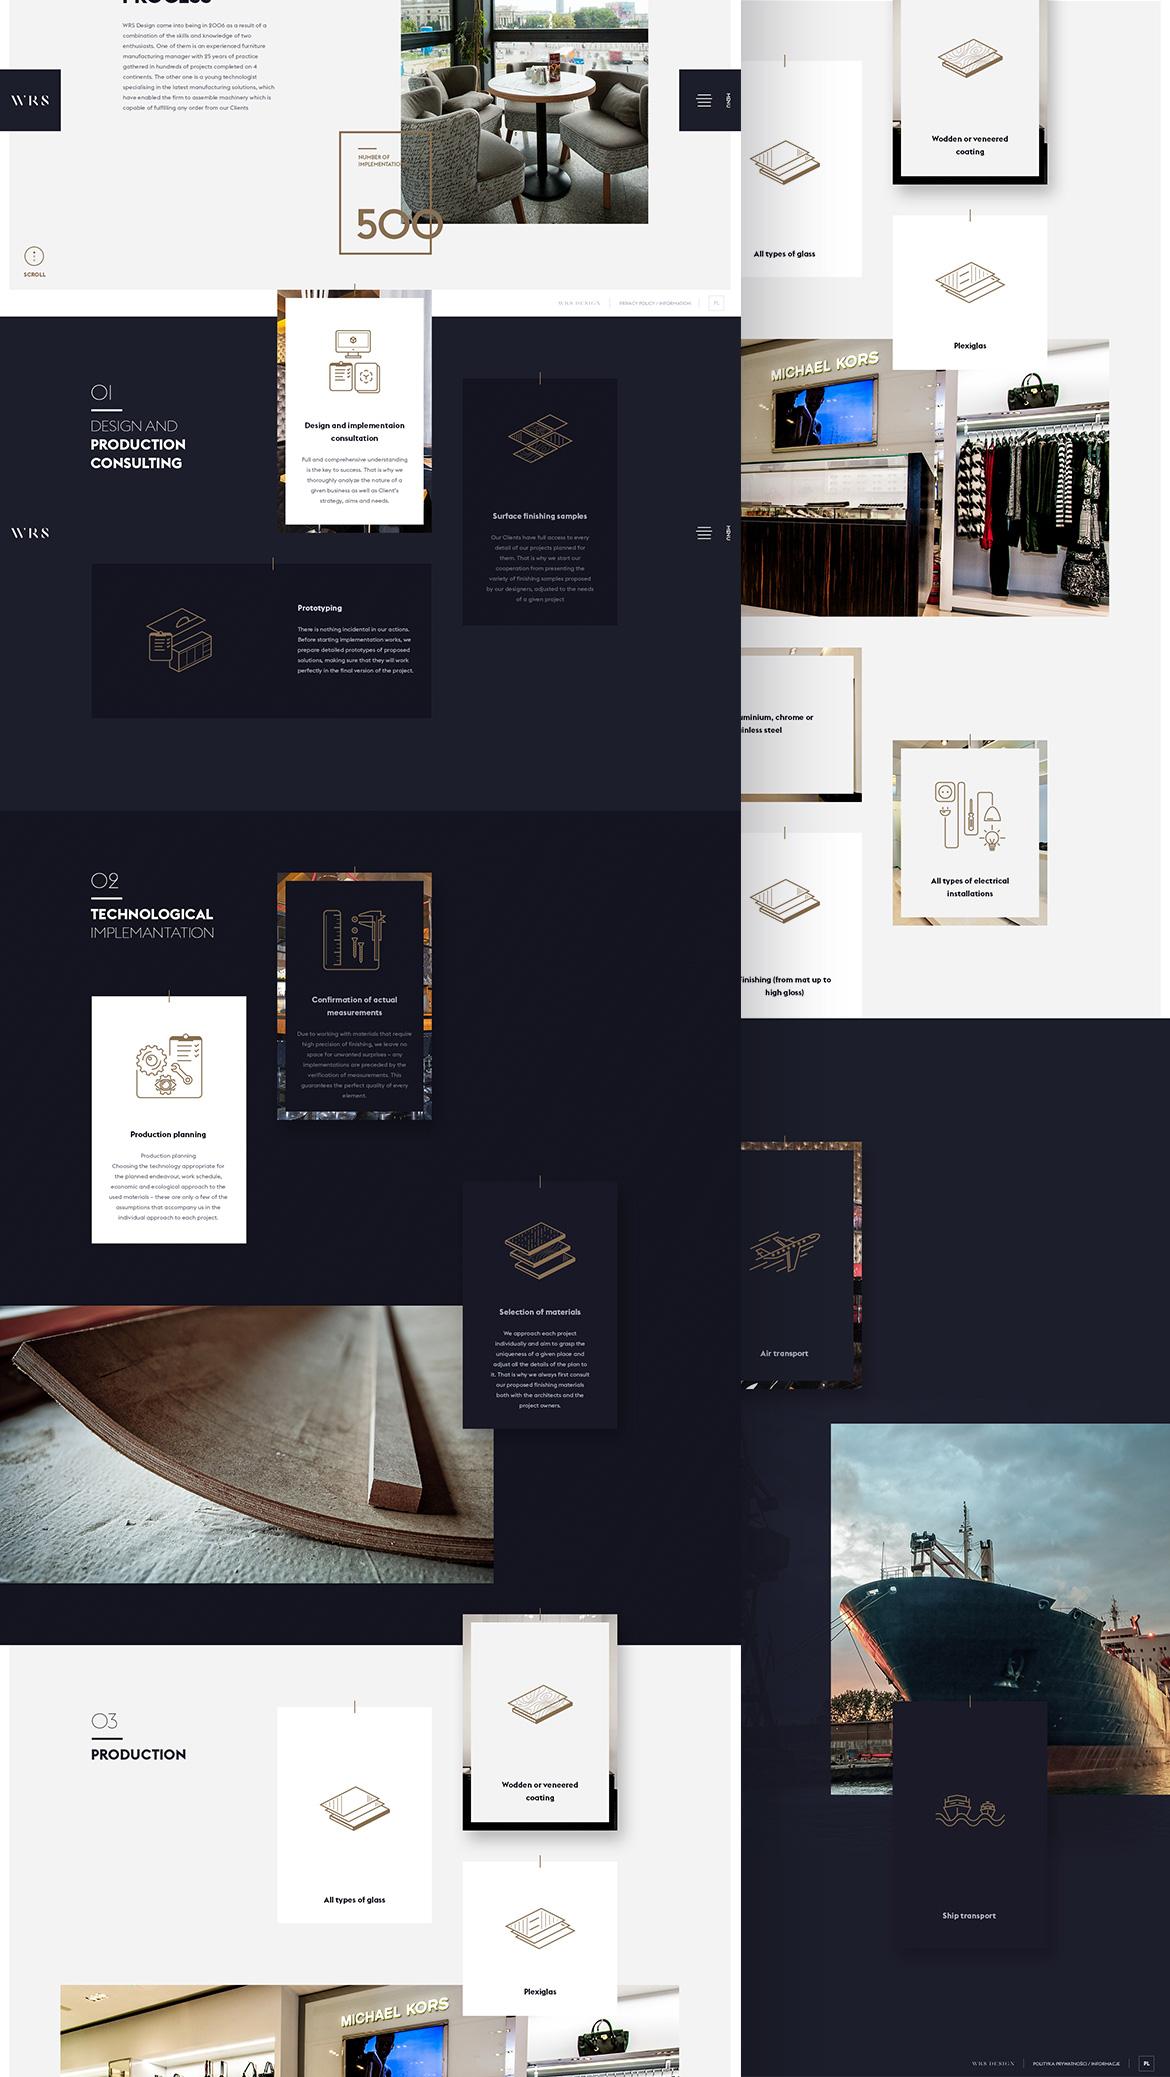 jakobsze-wrsdesign-web22